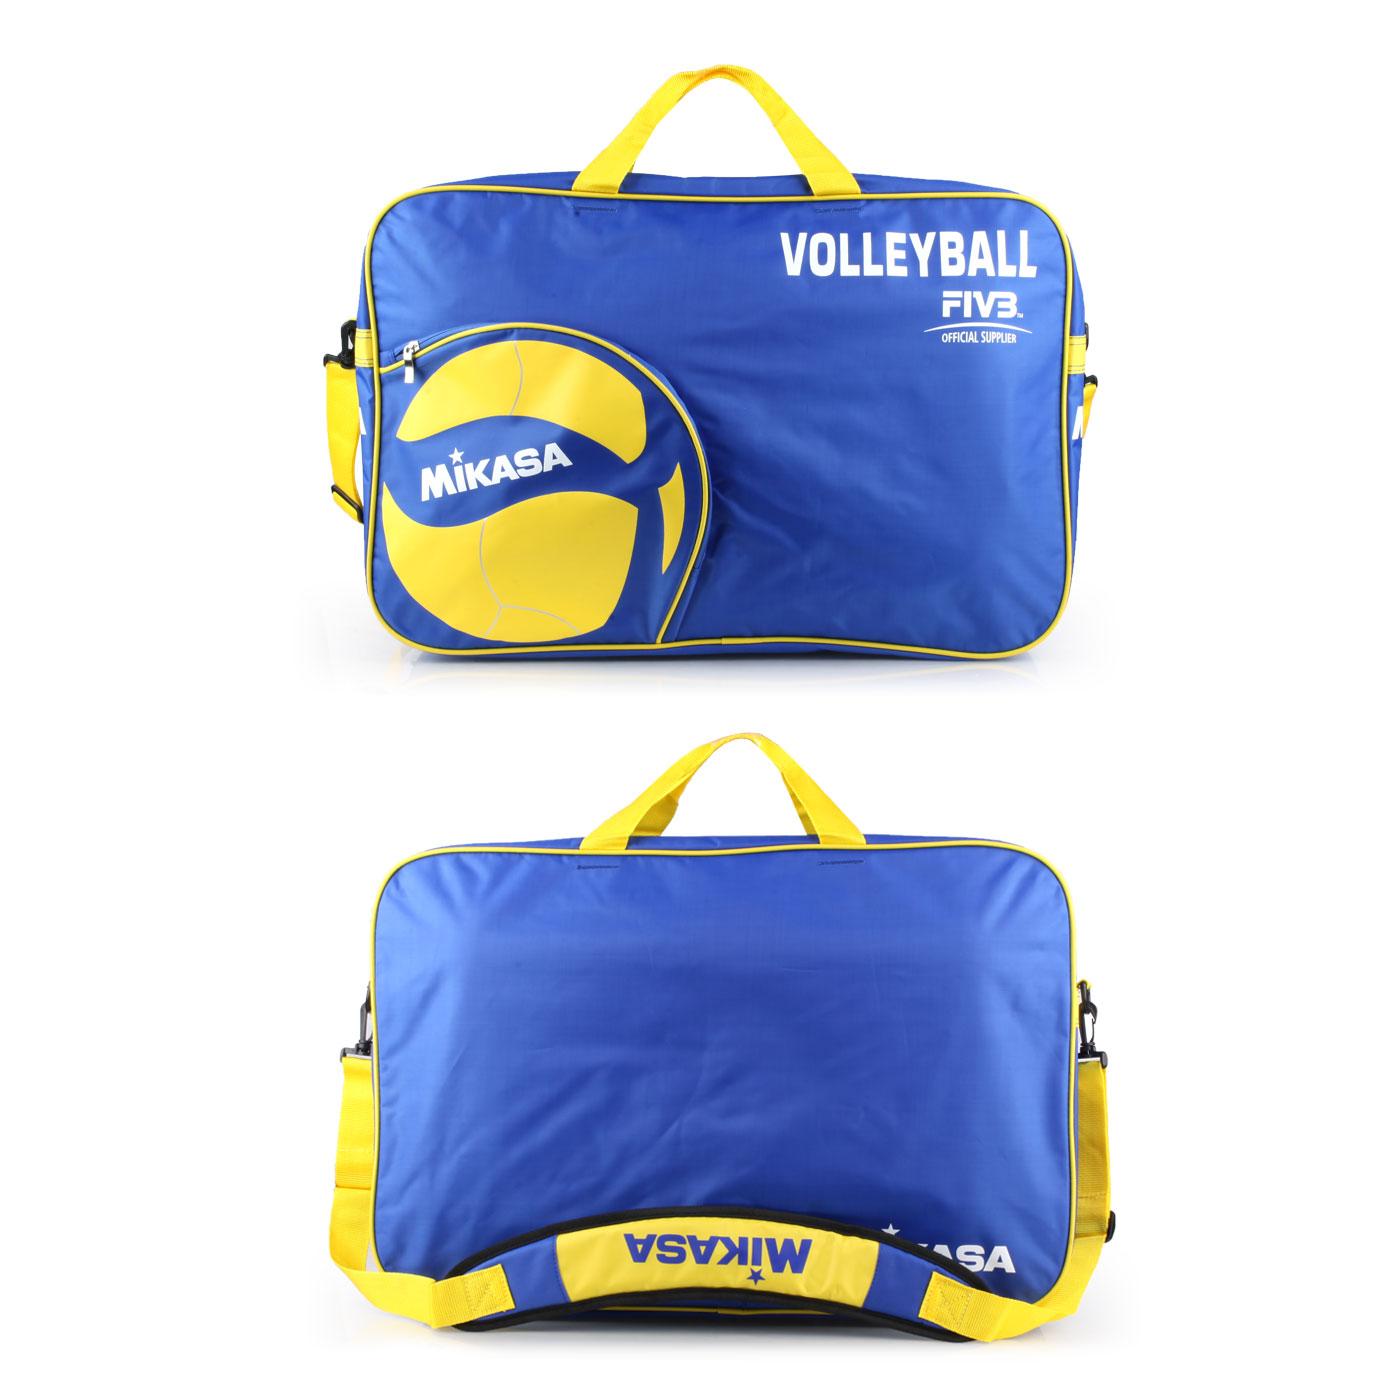 MIKASA 排球袋(6顆裝) MKAC-BG260W-BL